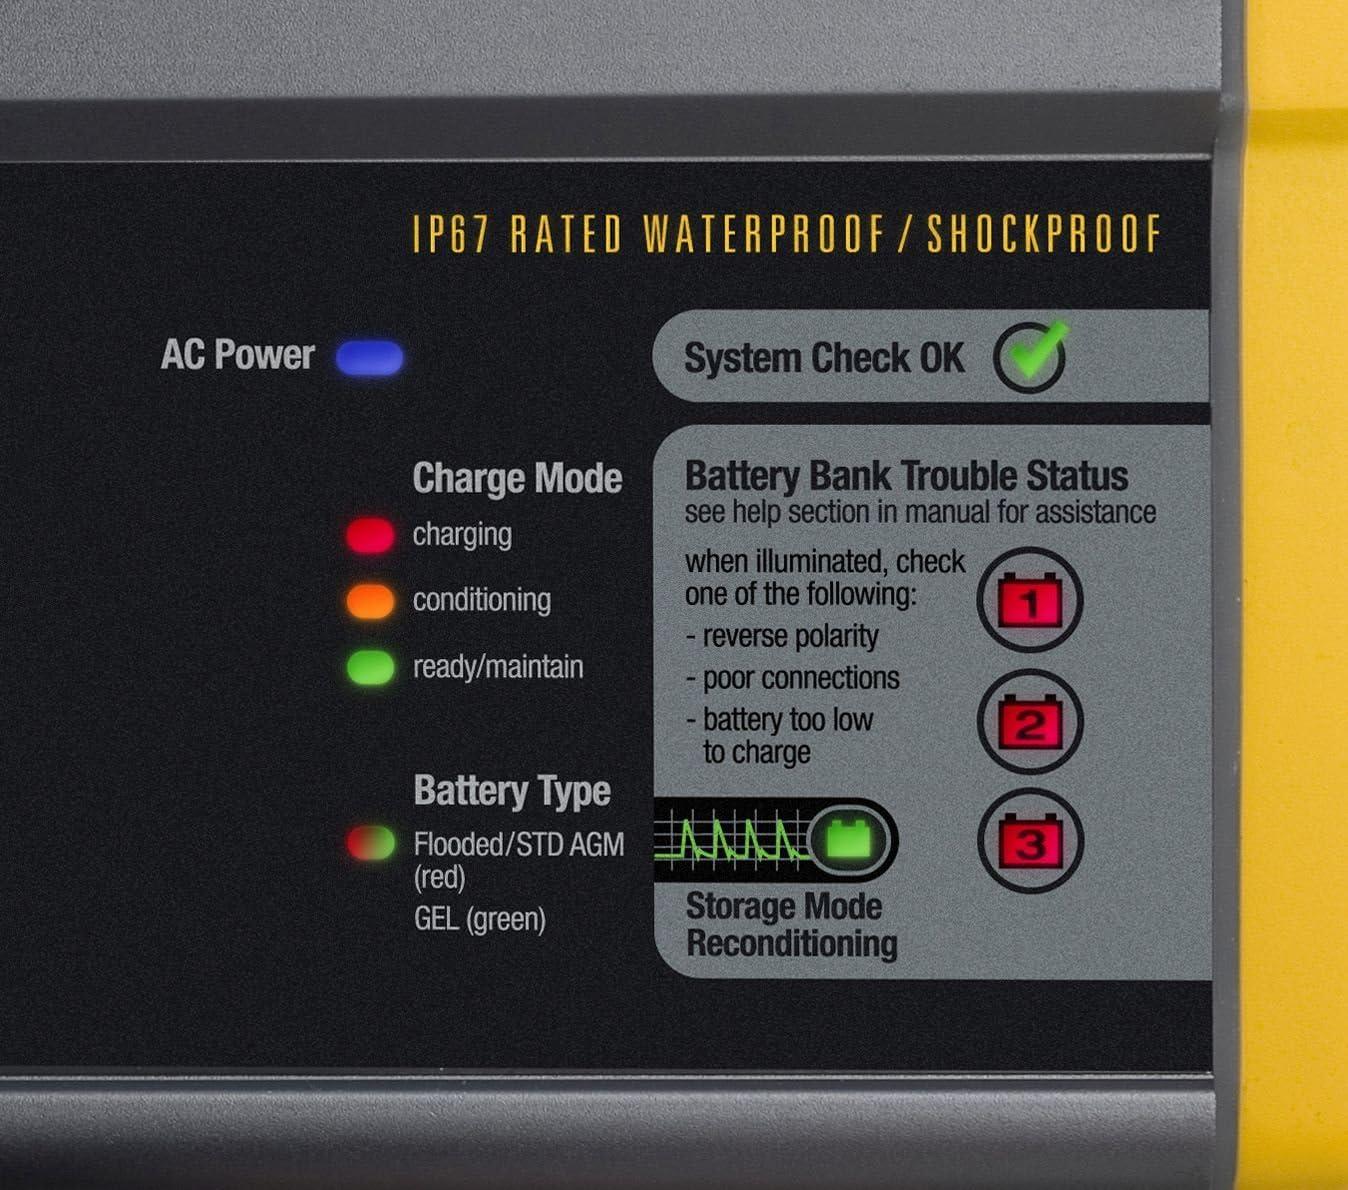 Promariner 43021 Battery Charger Prosport 20 Amp - 3 Bank: Automotive